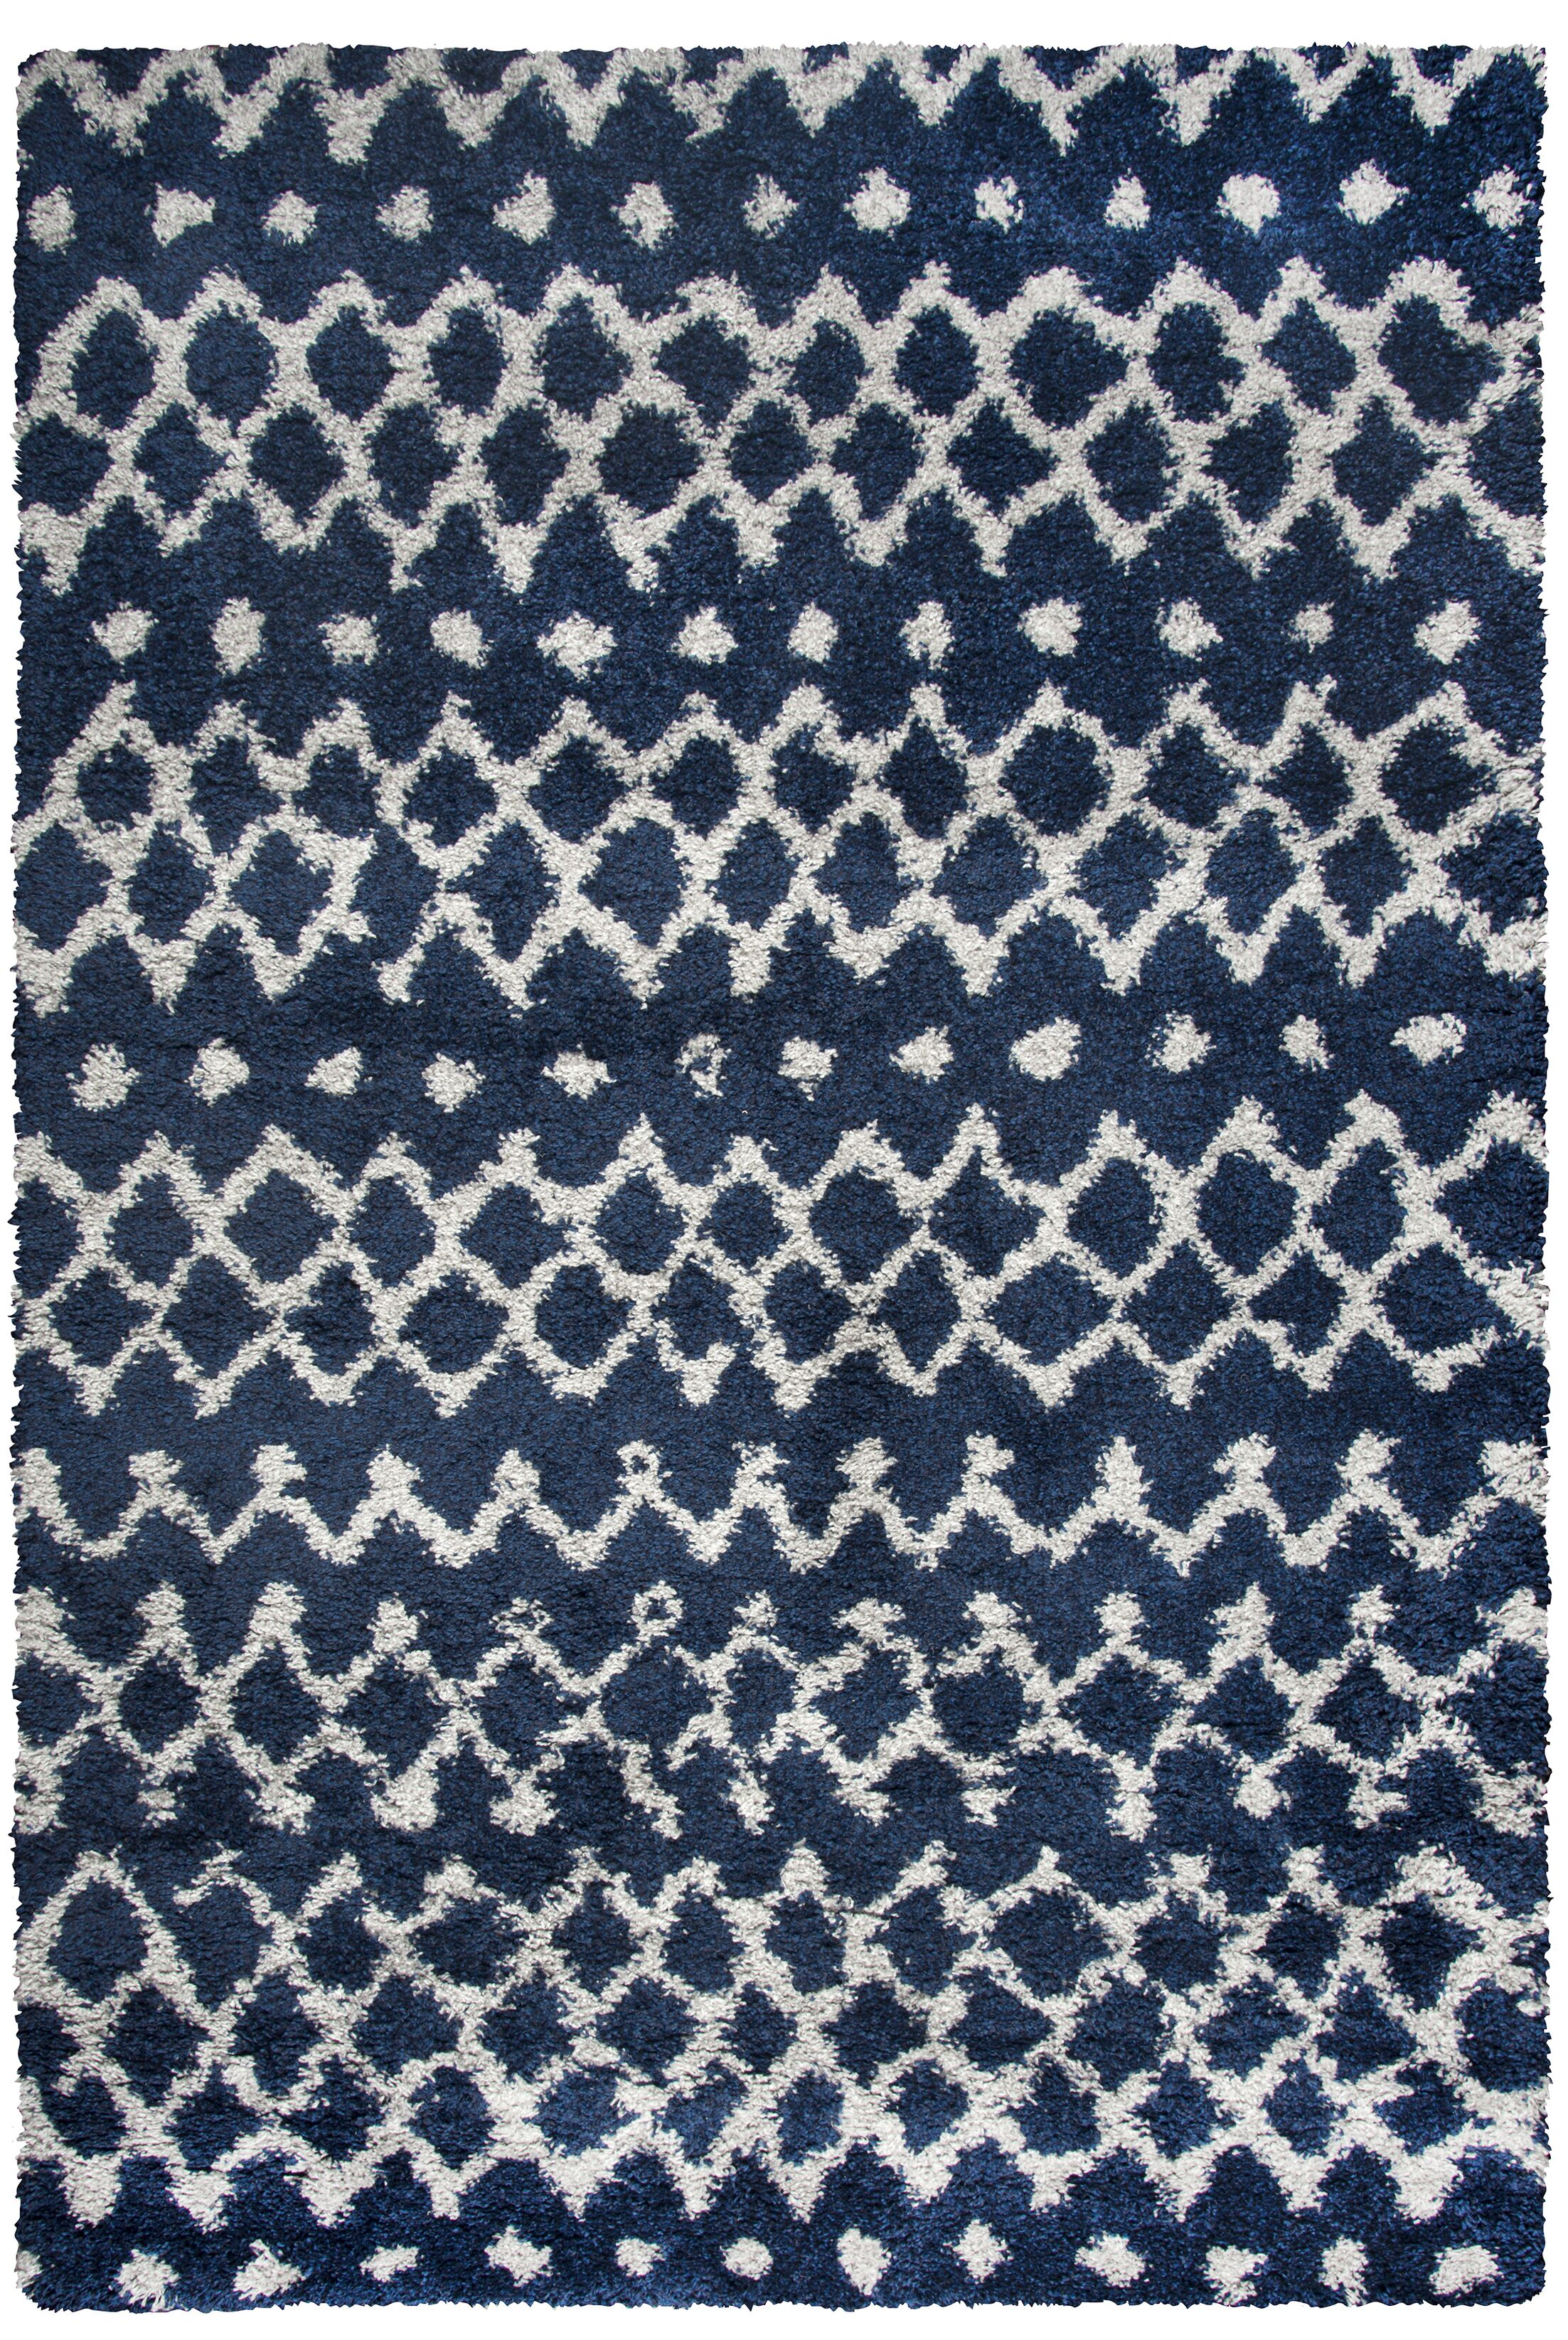 Matias Blue Shag Area Rug Rug Size: Rectangle 7'10